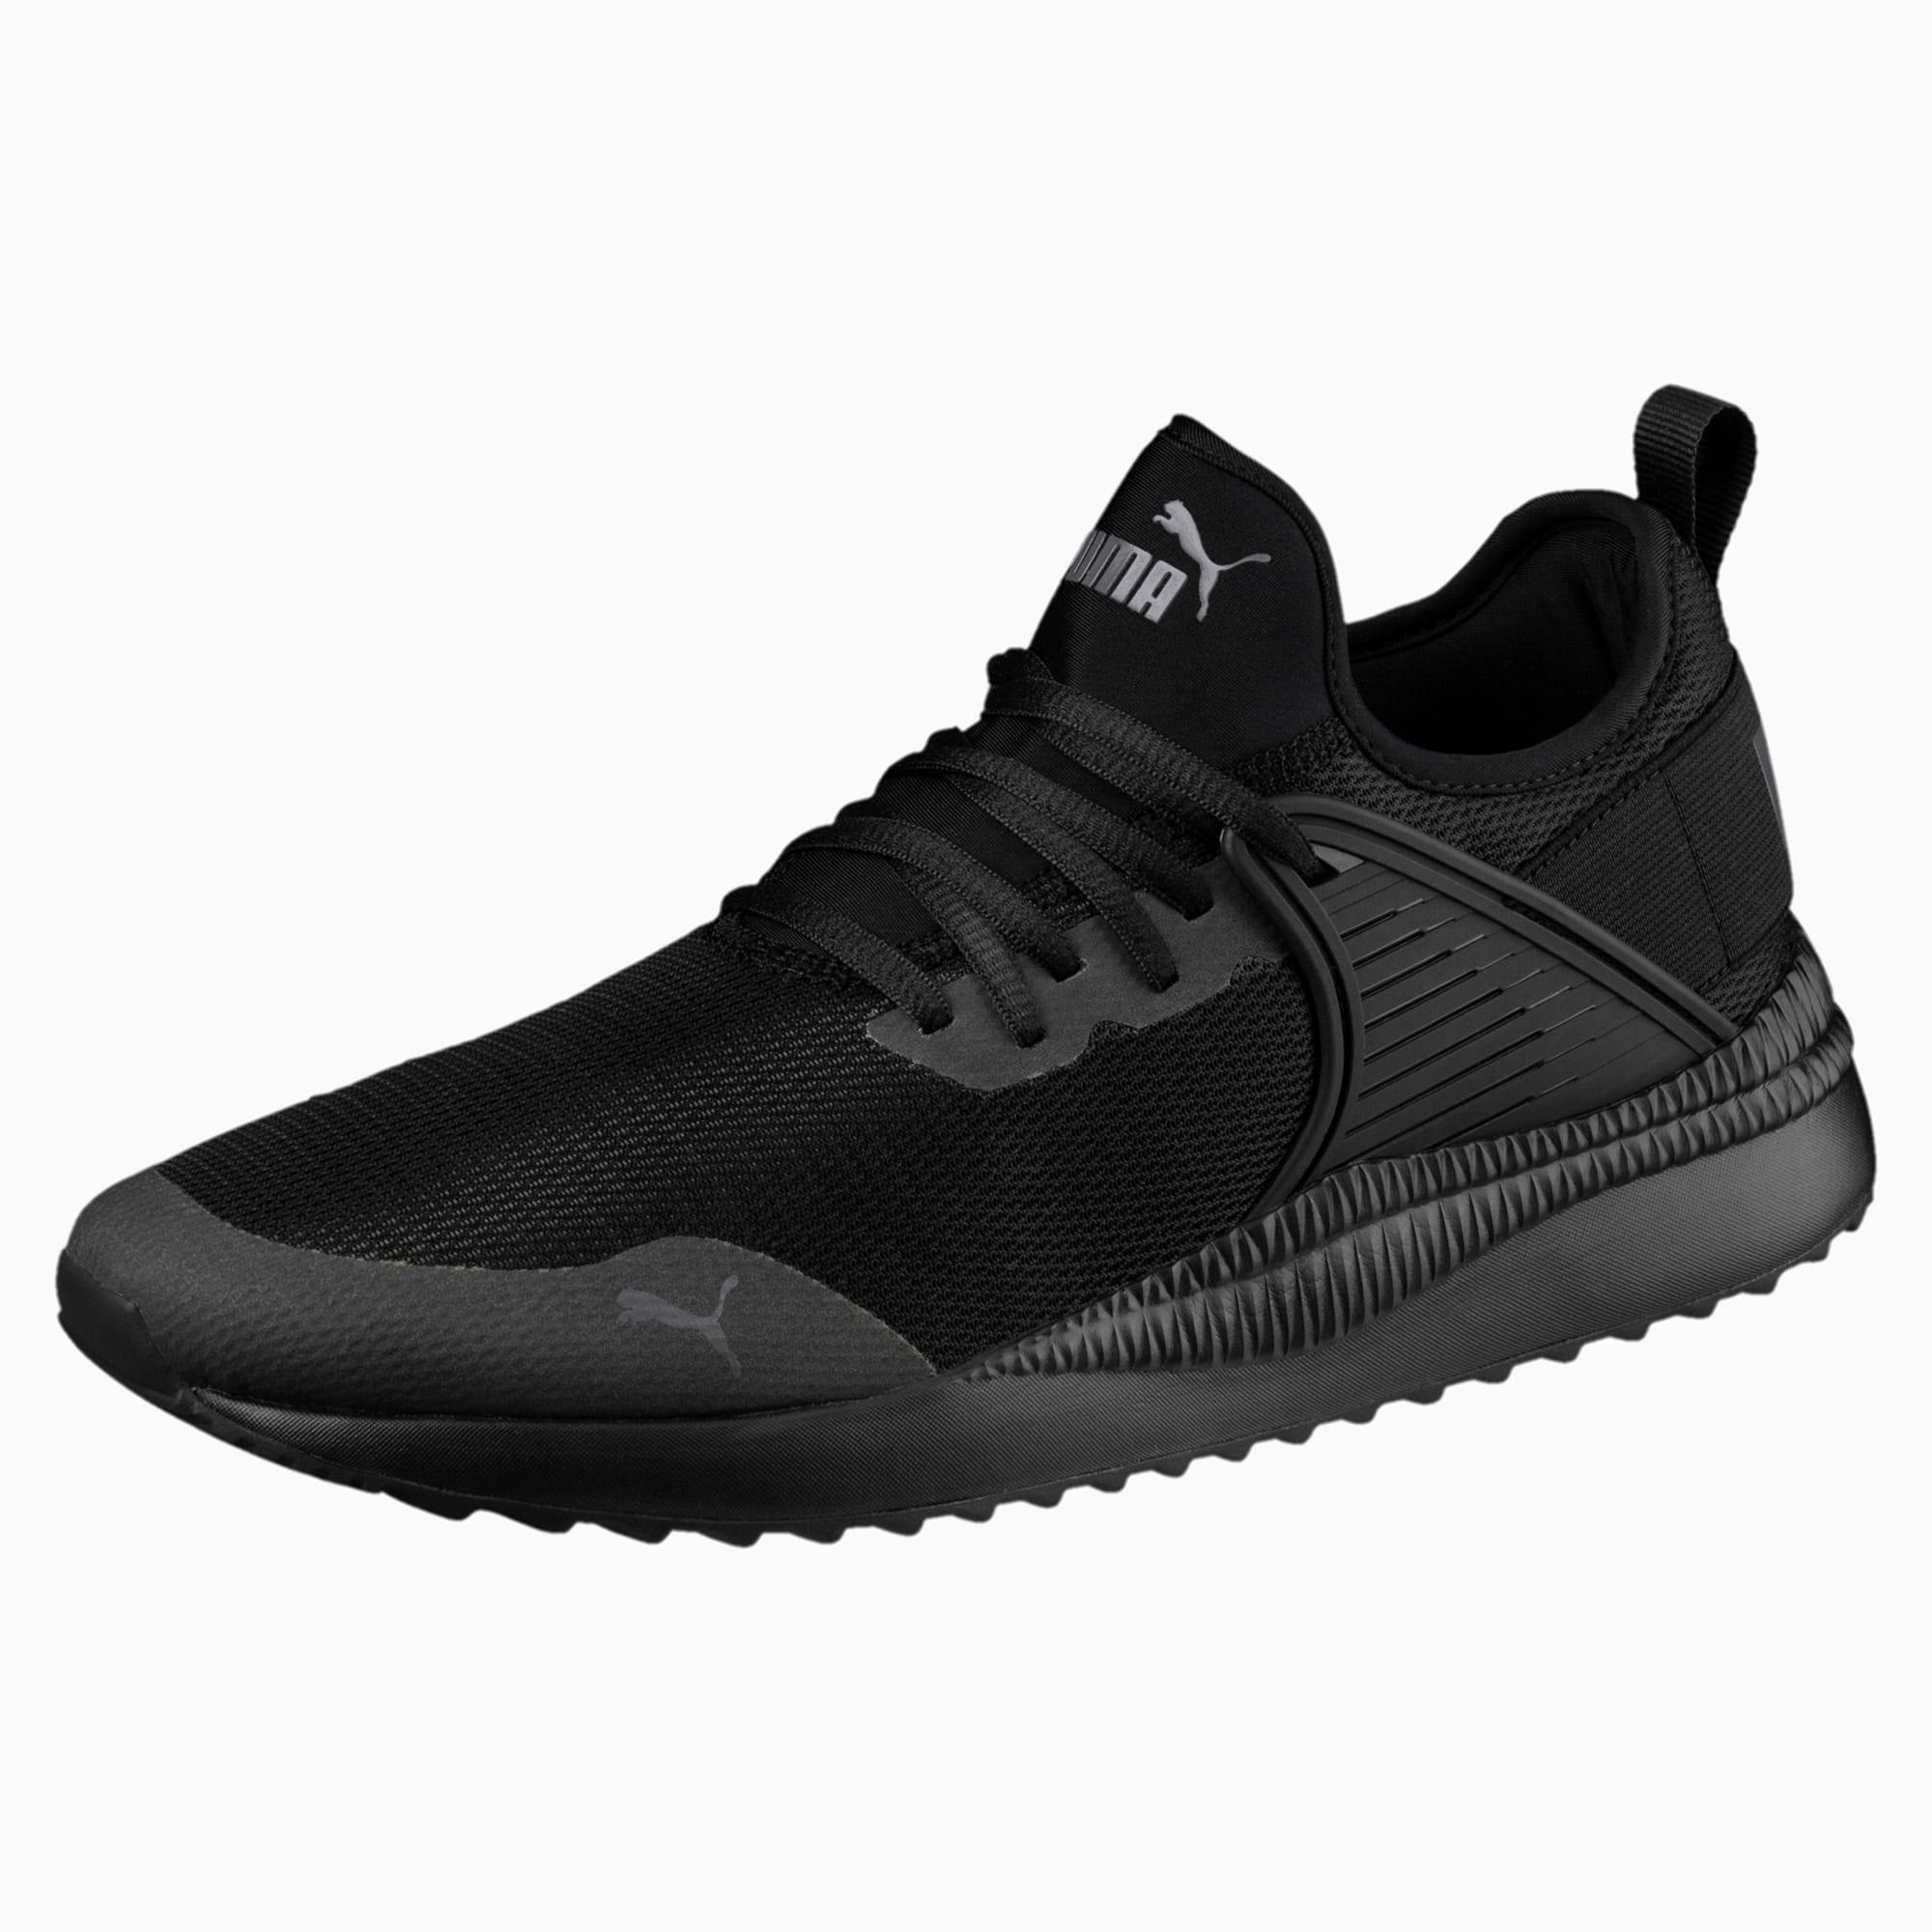 Zapatos deportivos Pacer Next Cage